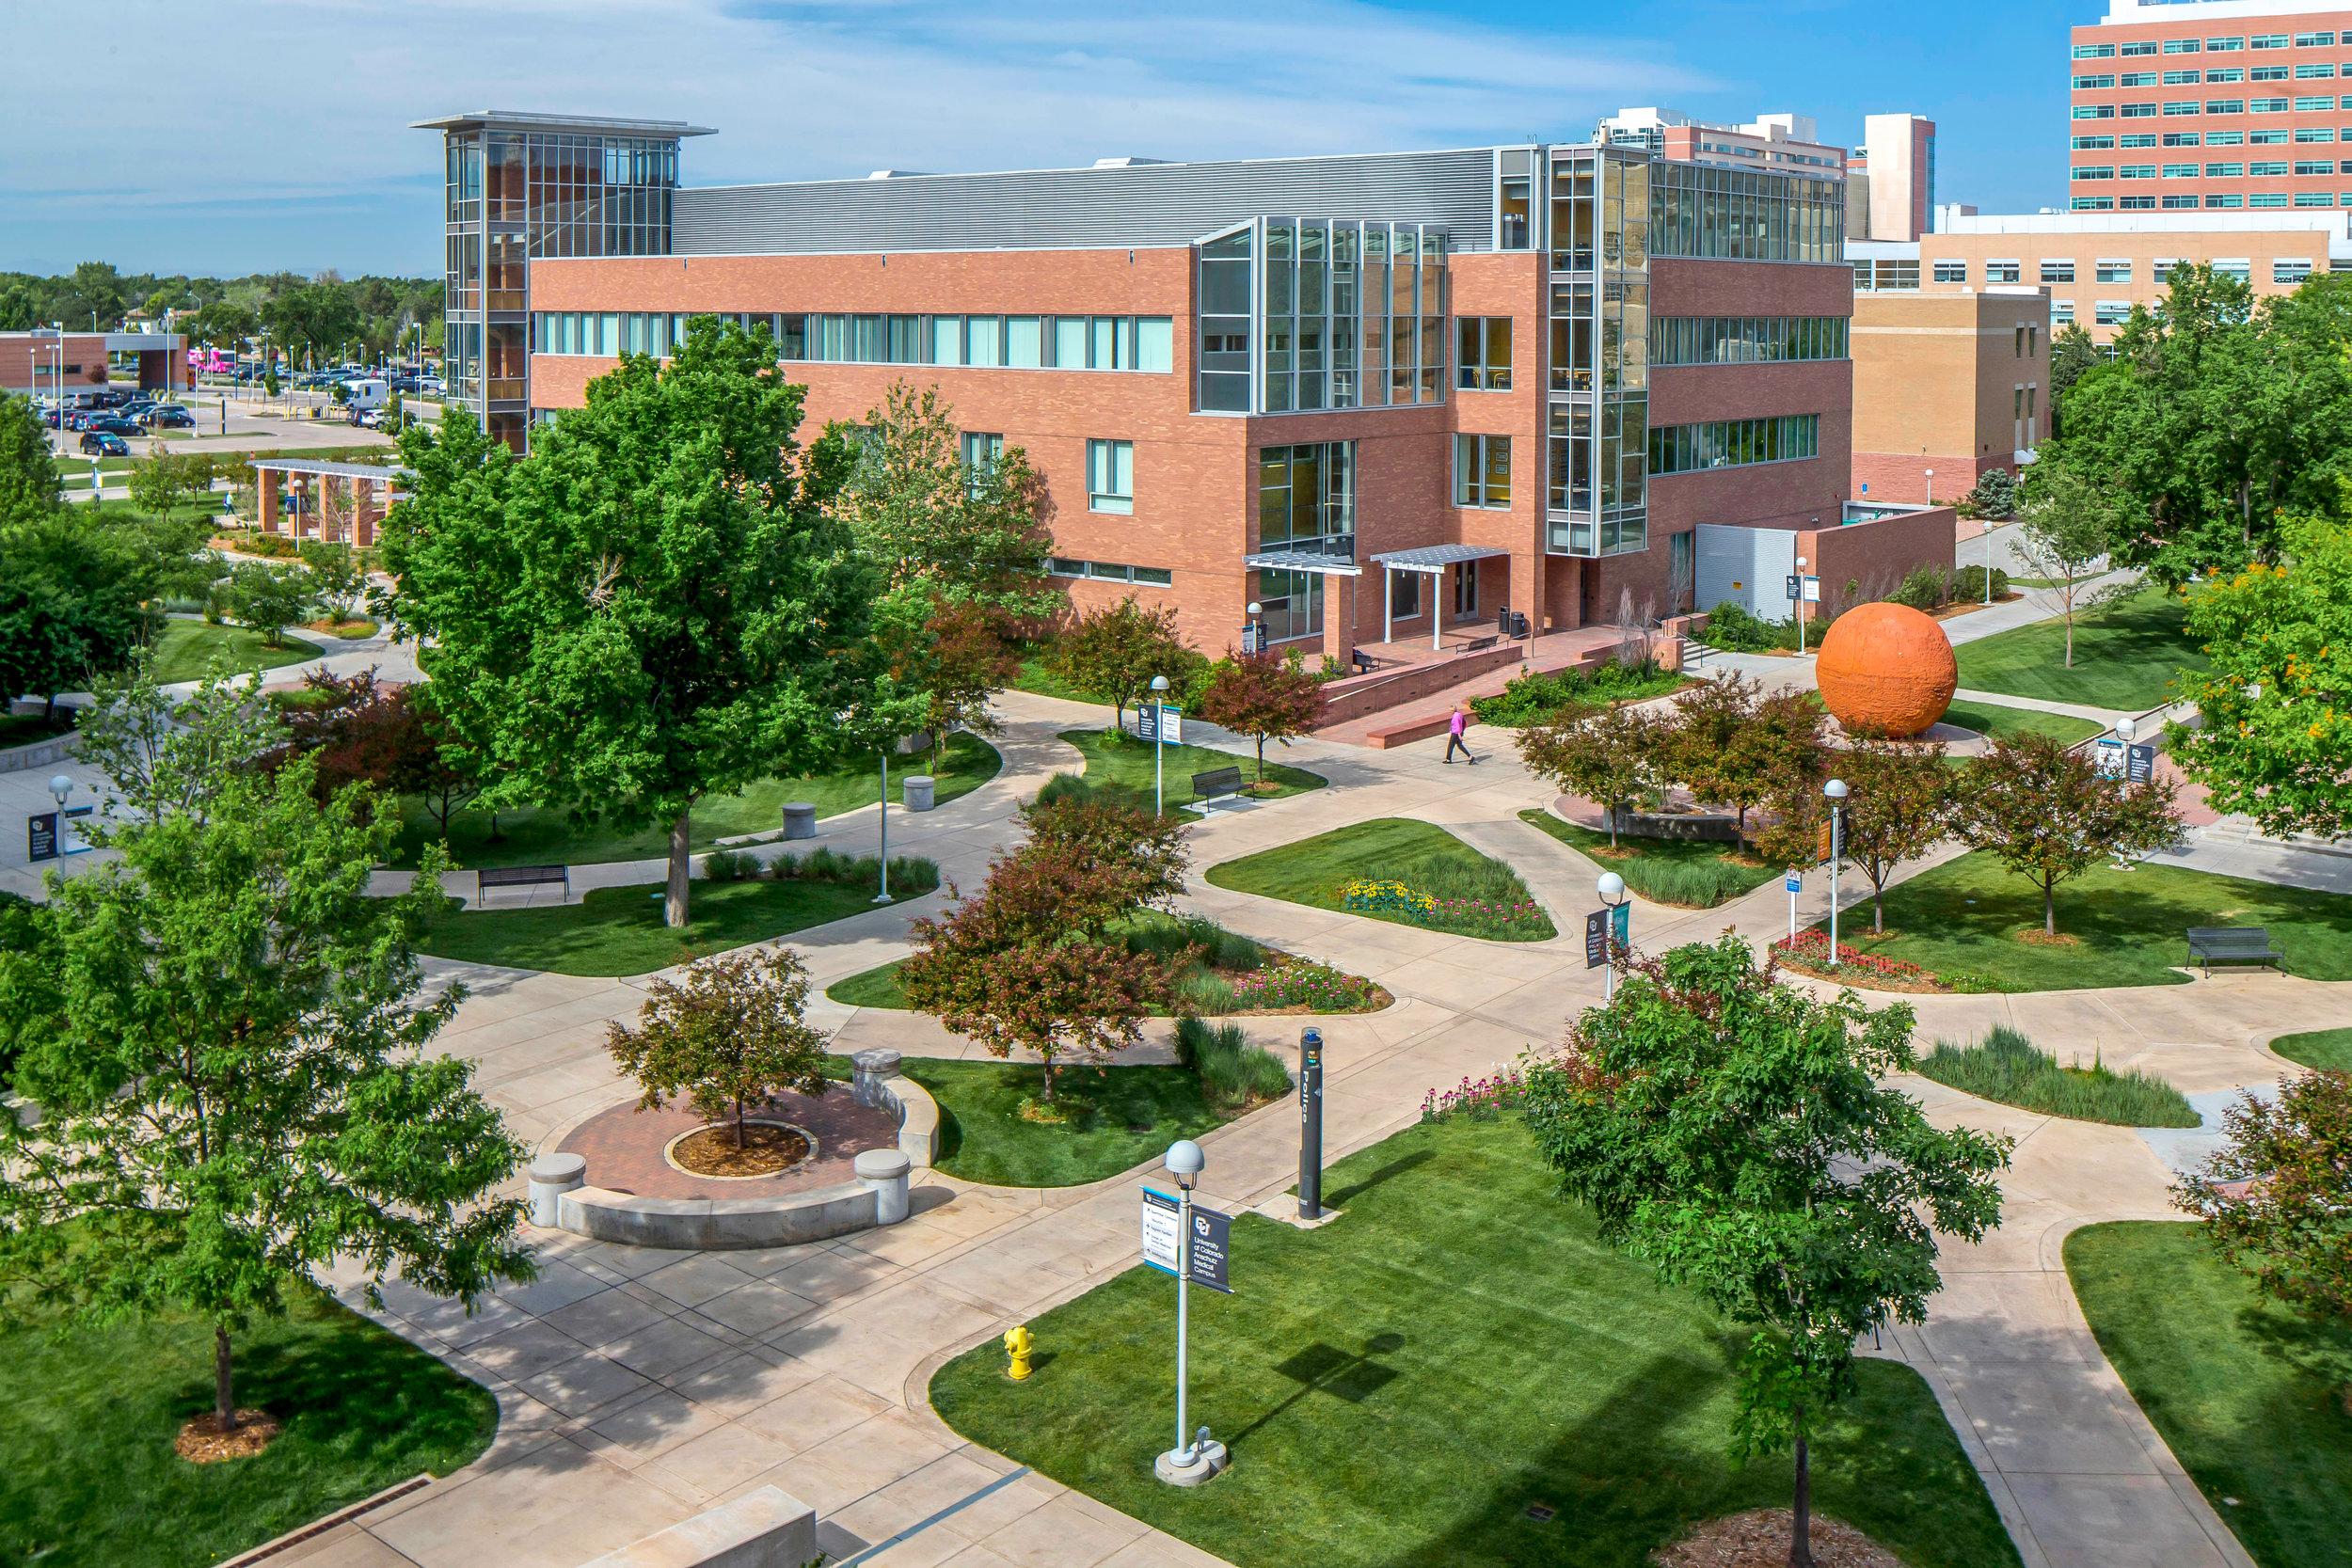 <f>Markets</f><f>Education+Health</f><f>Services</f><f>LandscapeArchitecture</f><f>Services</f><f>Planning</f><t>CU Anschutz Medical Center</t><m>Aurora, CO</m>